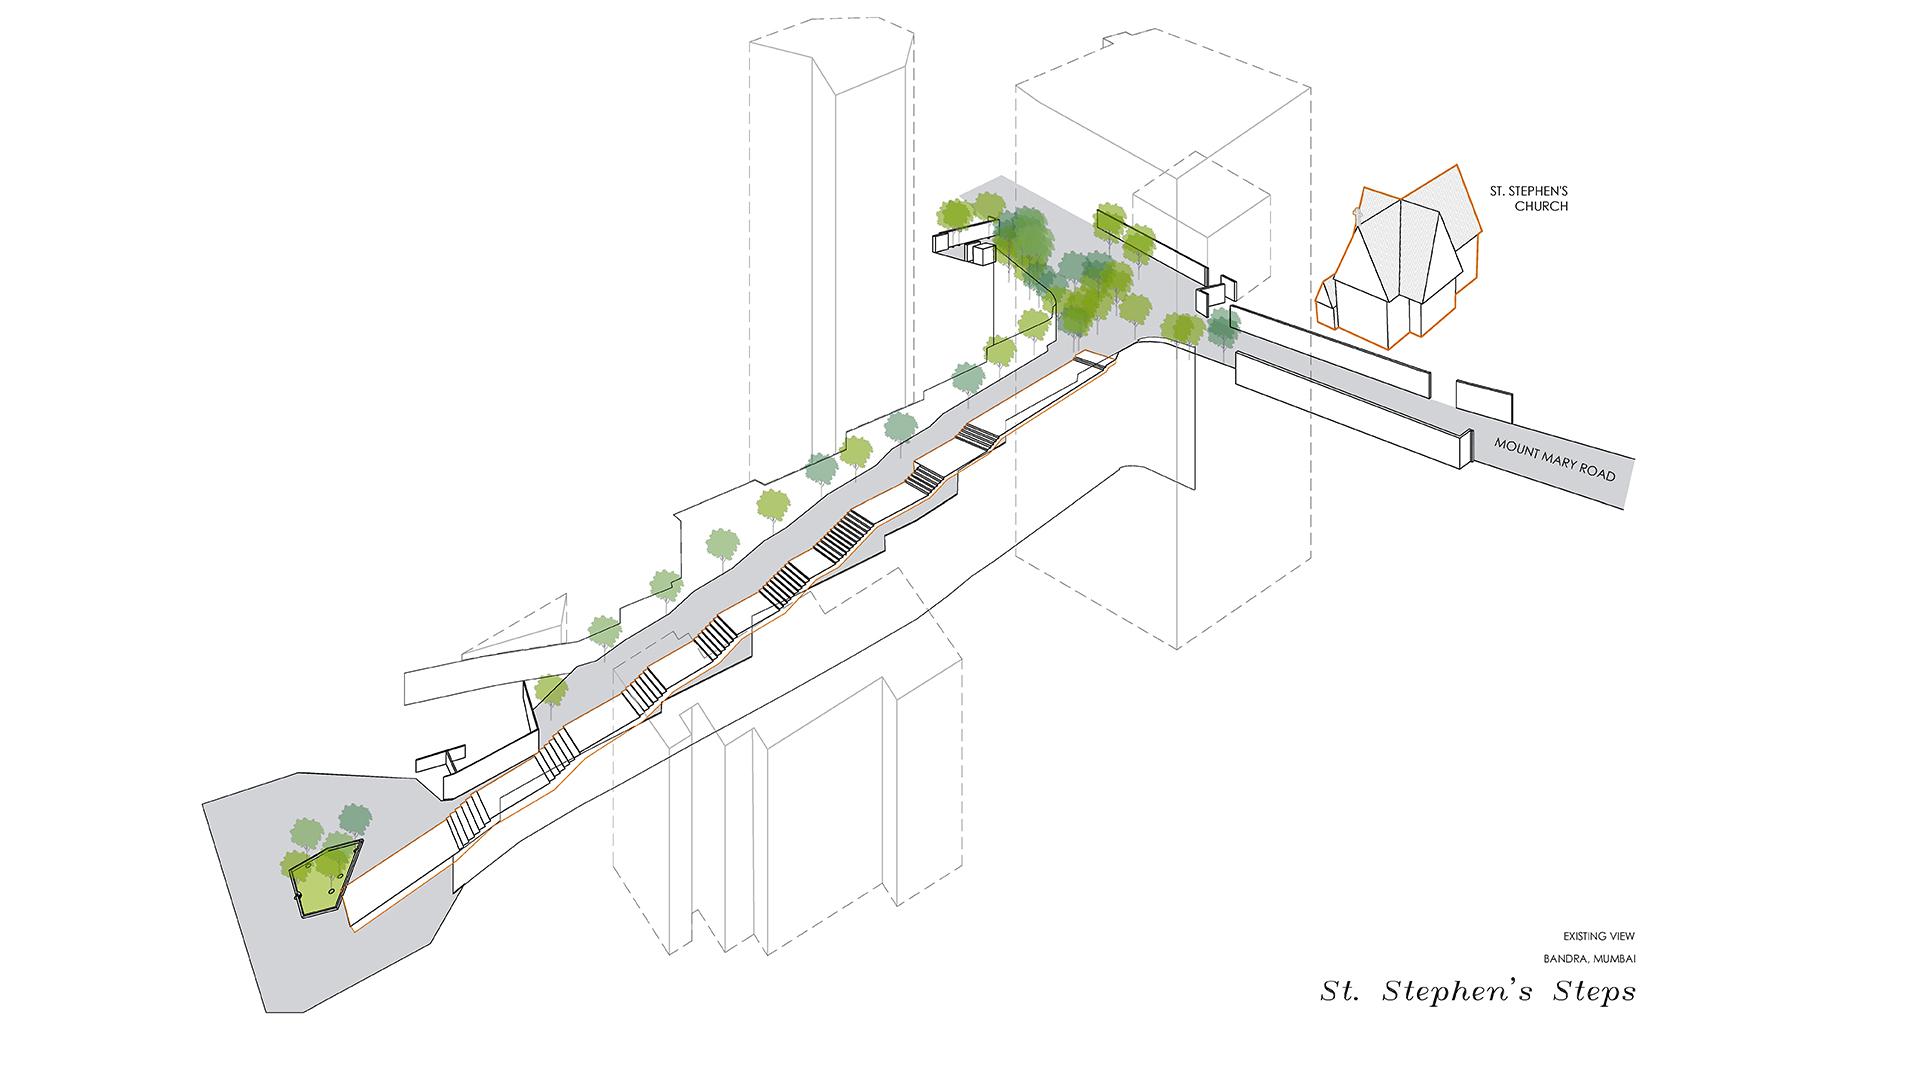 AJA_St Stephens Steps_01.jpg